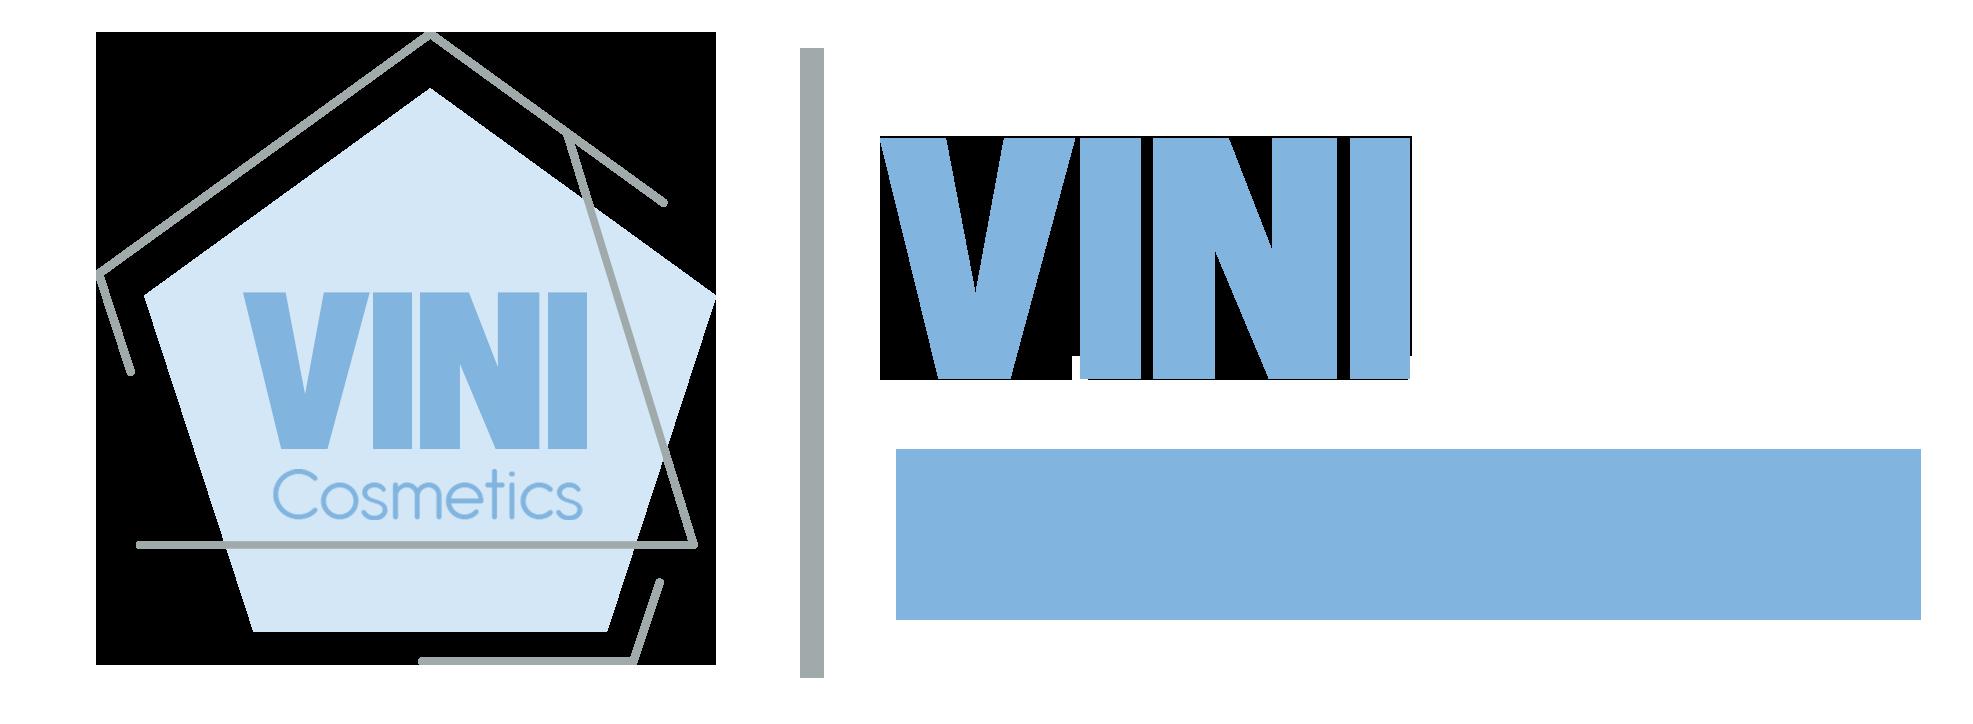 Vini cosmetics